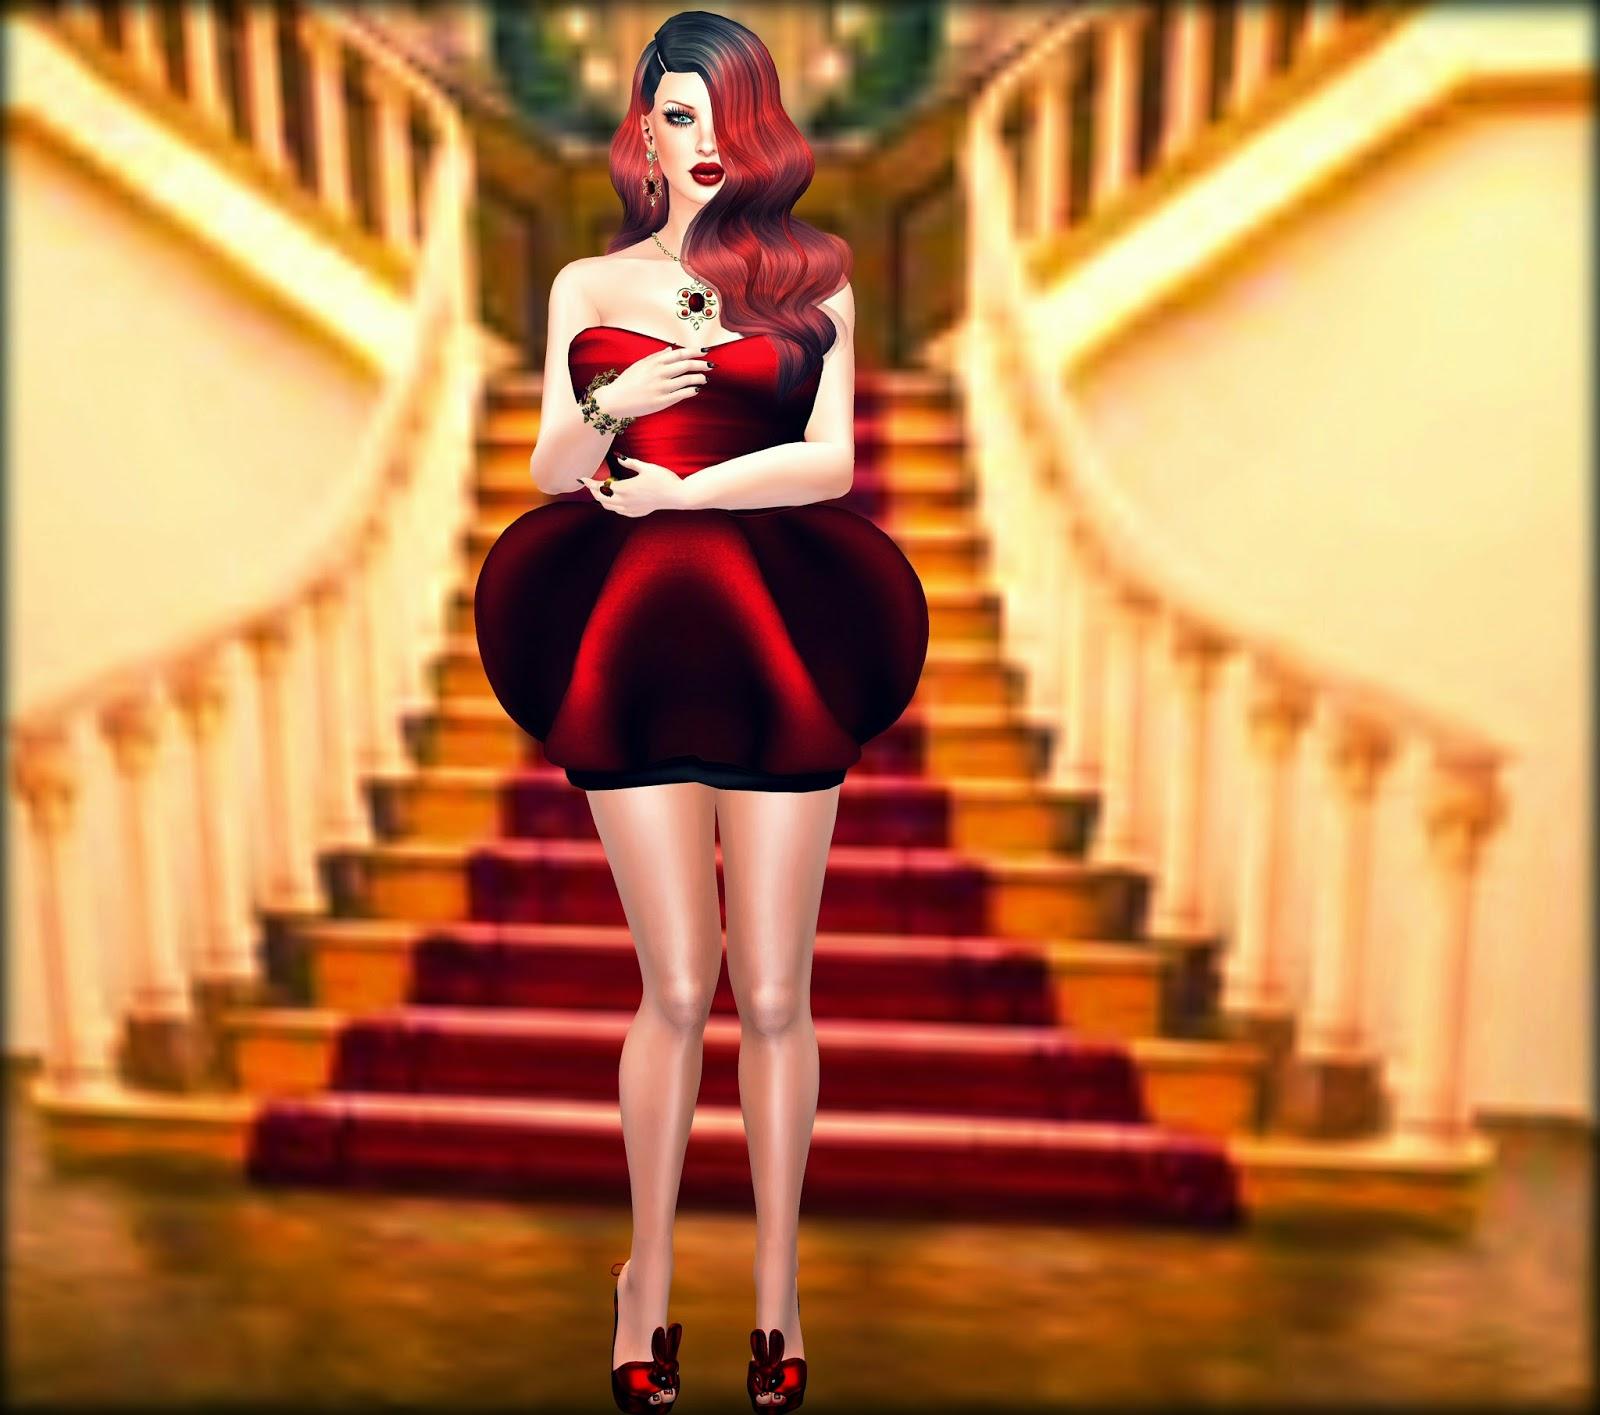 avale rachelle dress,zoz bunny shoes